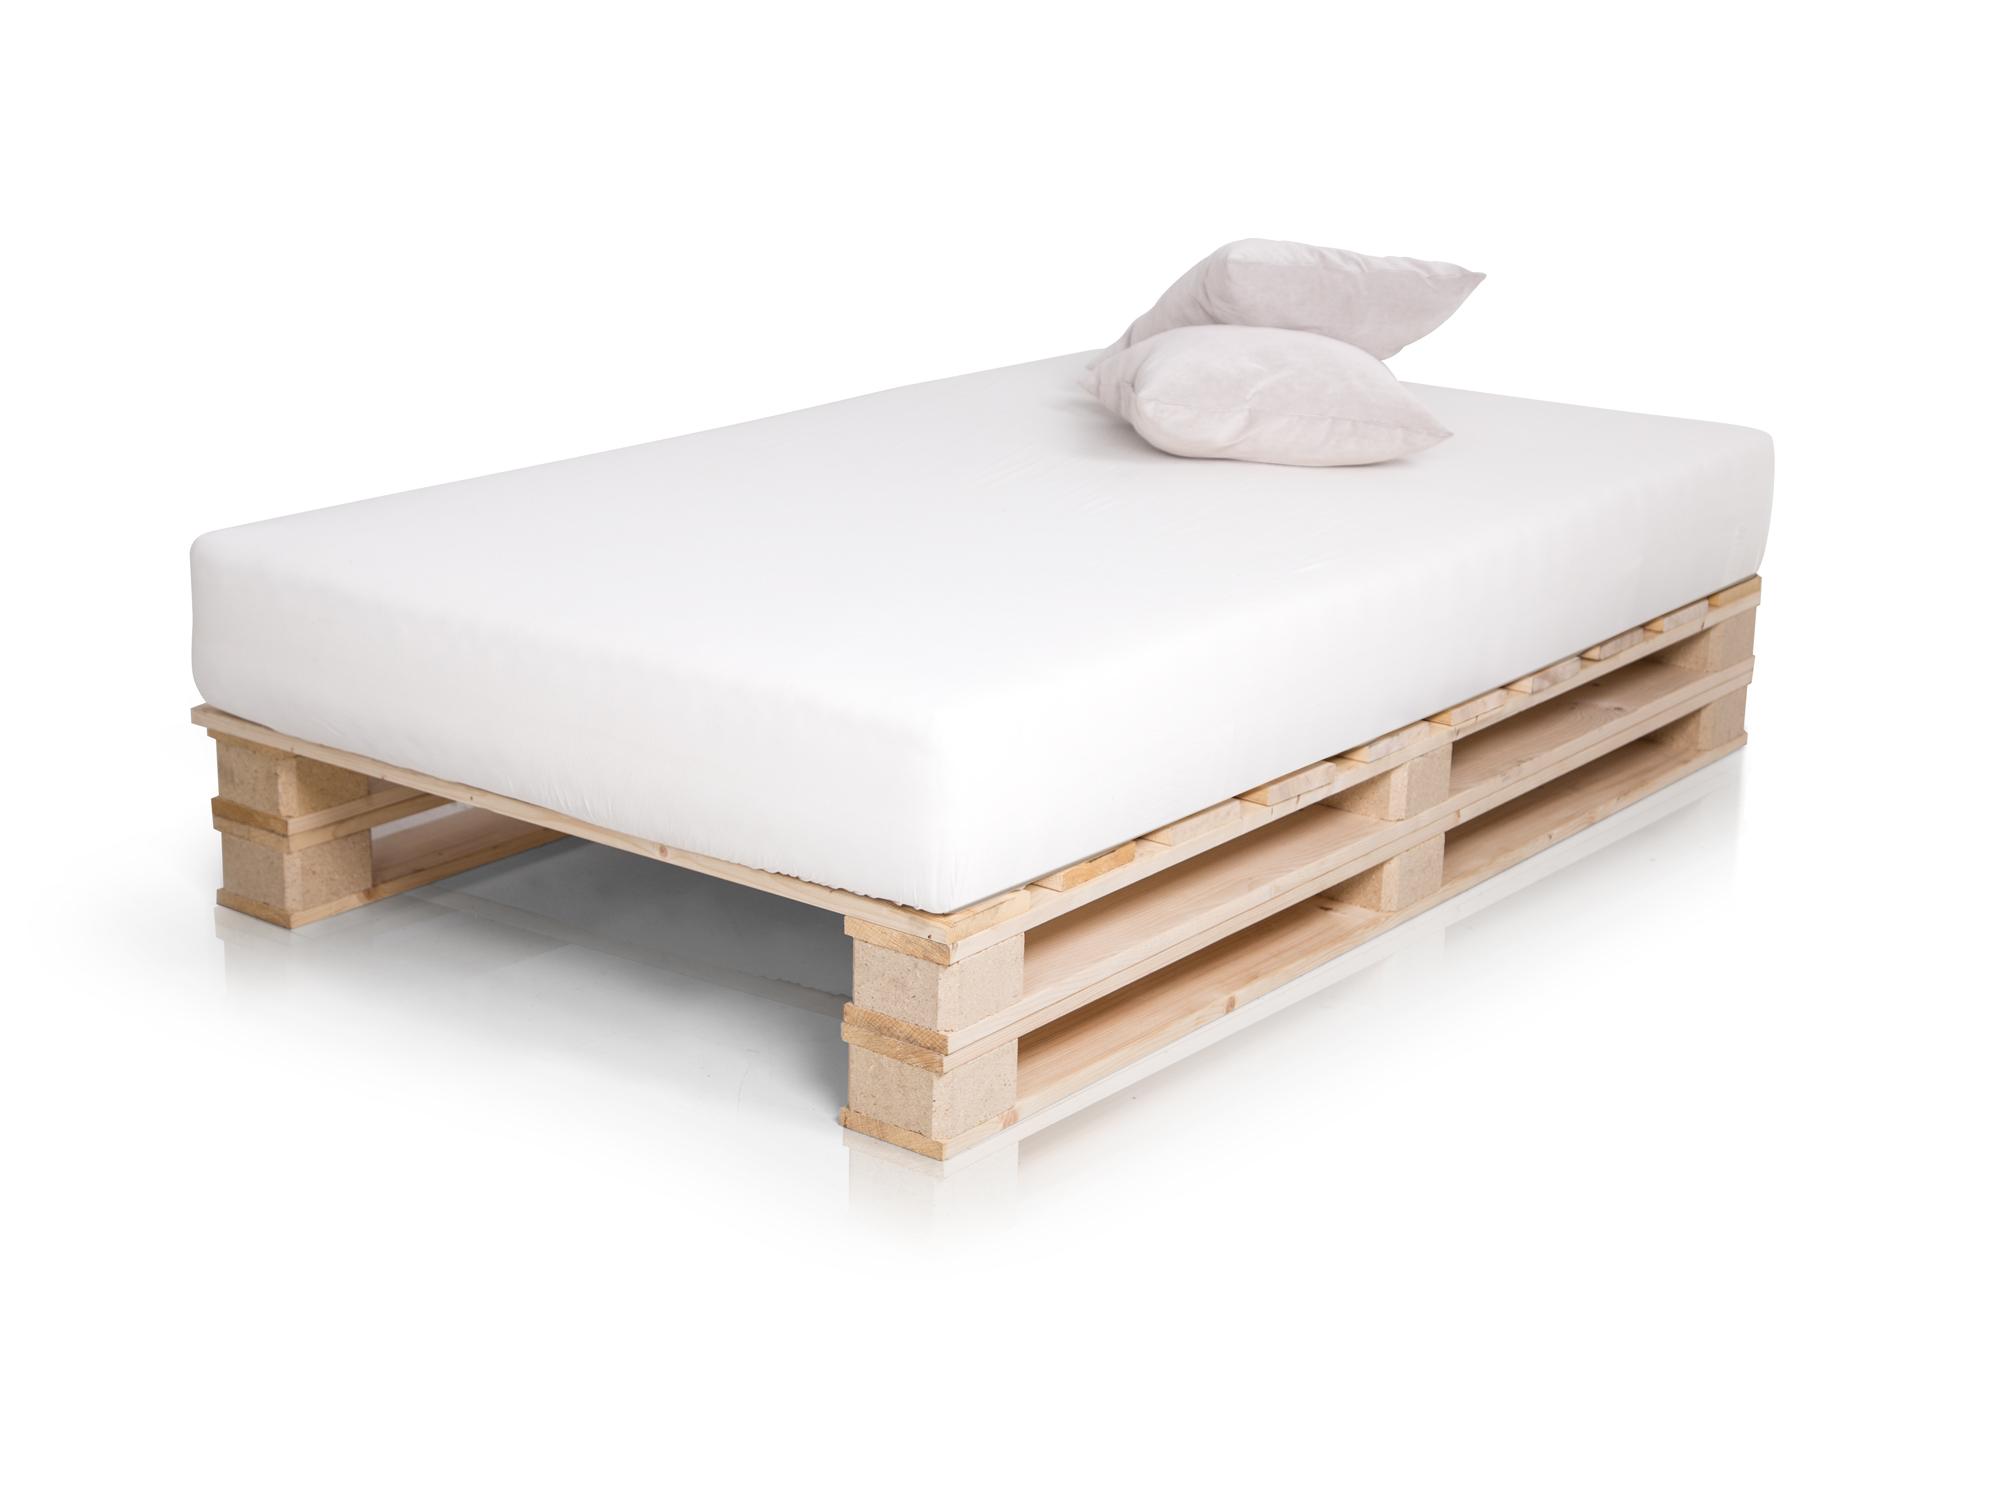 Full Size of Bett 120x200 Paletti Duo Futonbett Massivholzbett Singlebett Bettgestell Fichte 90x200 Weiß Mit Schubladen 160x200 Lattenrost Betten überlänge 200x200 Bett Bett 120x200